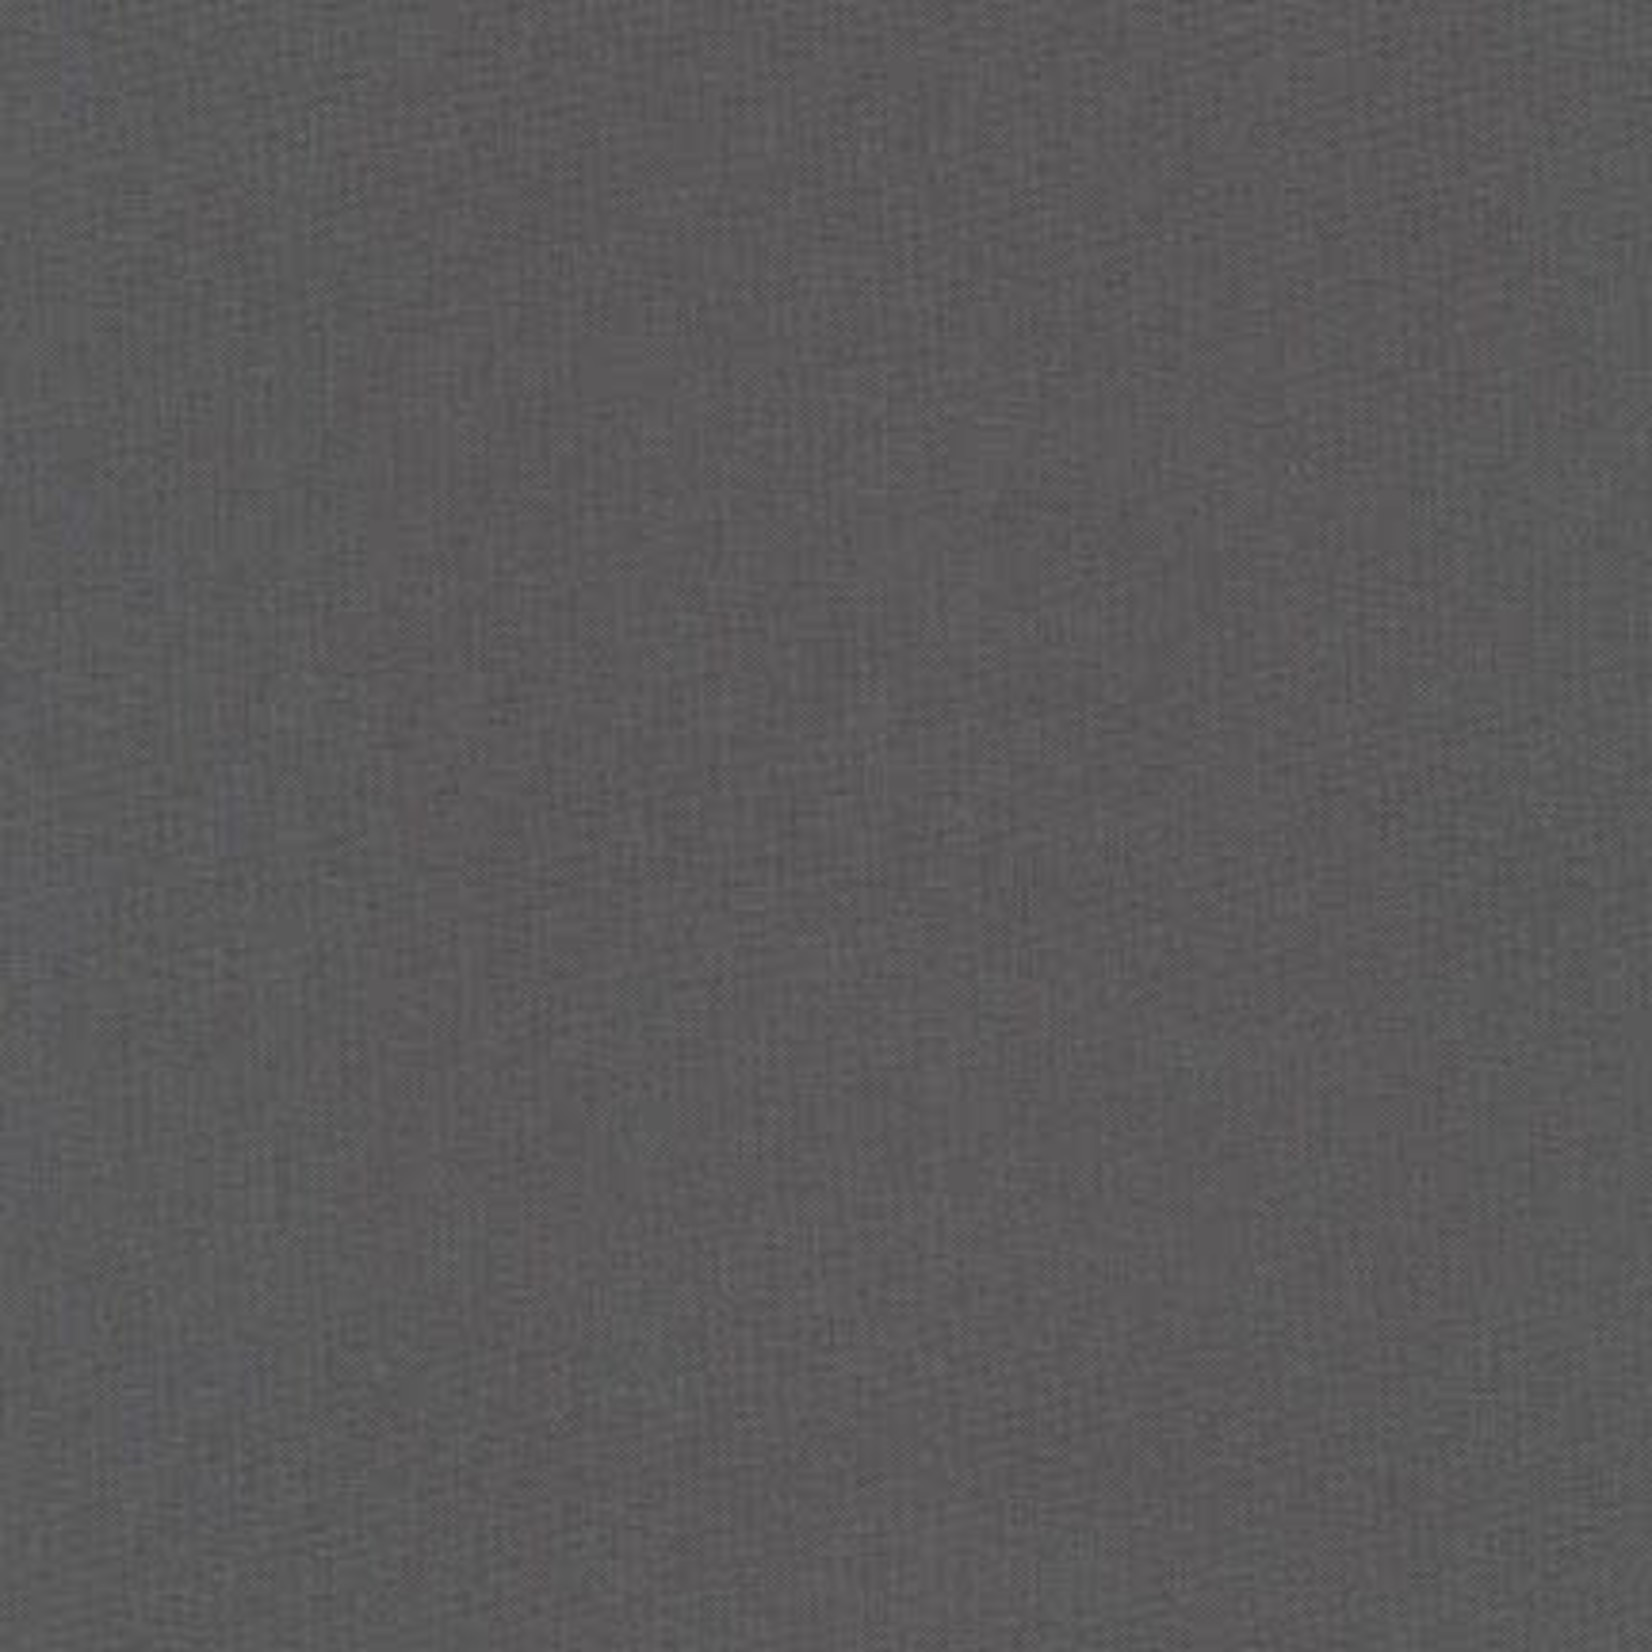 Kona KONA  K001-1080 COAL, PER CM OR $14/M